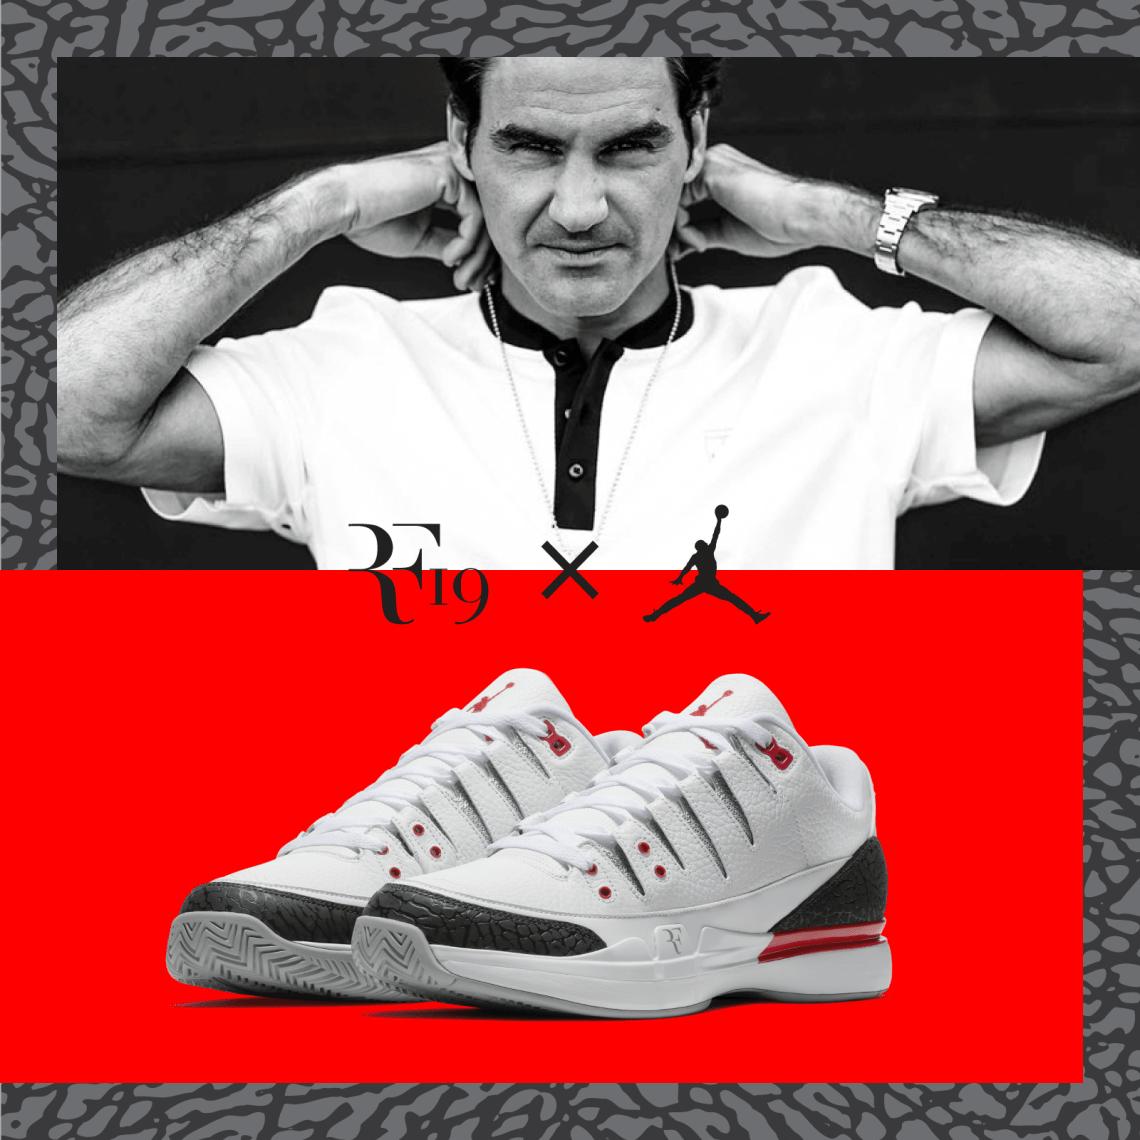 Roger Federer and Nike Debut Zoom Vapor Air Jordan 3